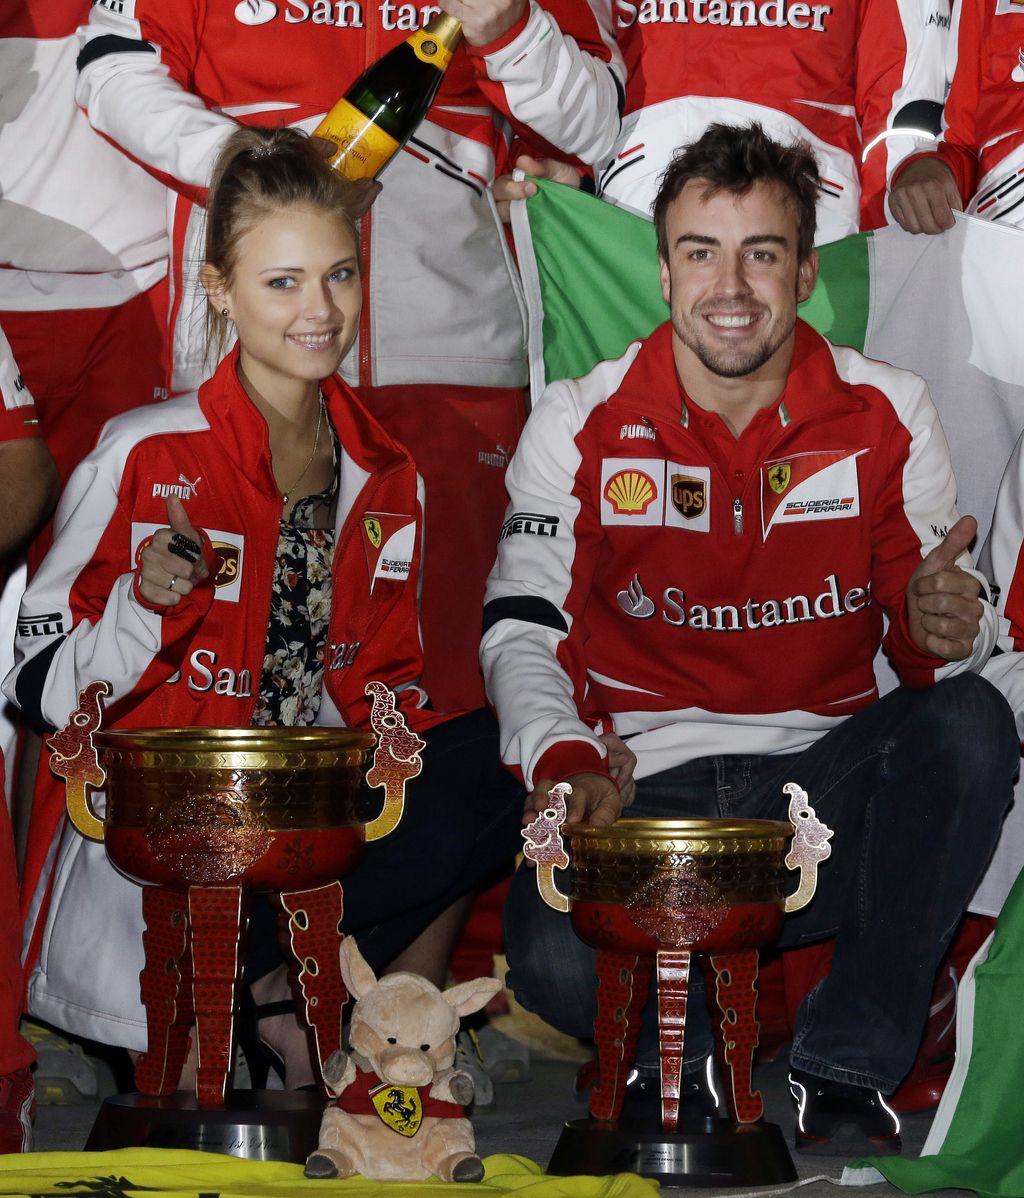 Fernando Alonso celebra la victoria de Shanghái junto a su chica